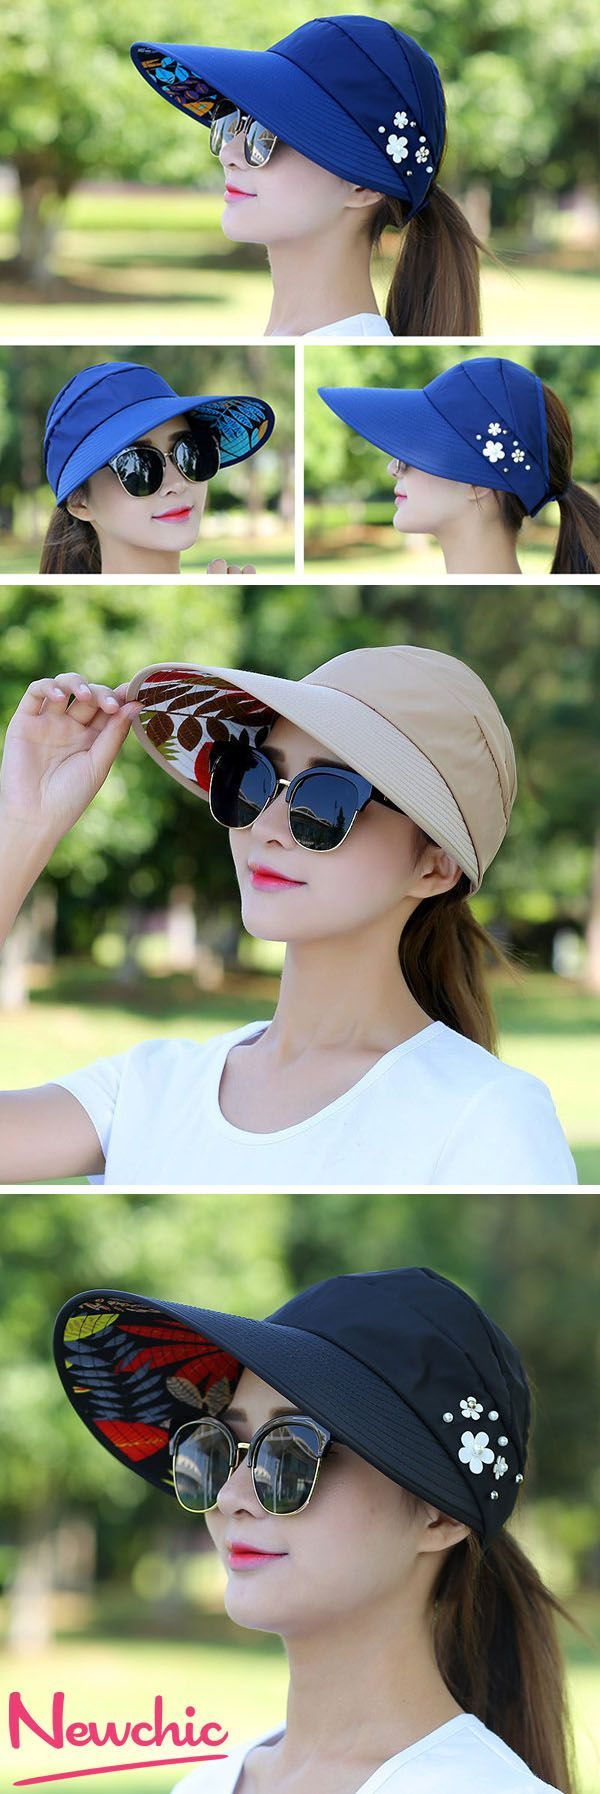 Women Summer Outdoor Gardening Anti-UV Foldable Beach Sunscreen Sun Hat  Flower Print Cap e8eaeba01b4e